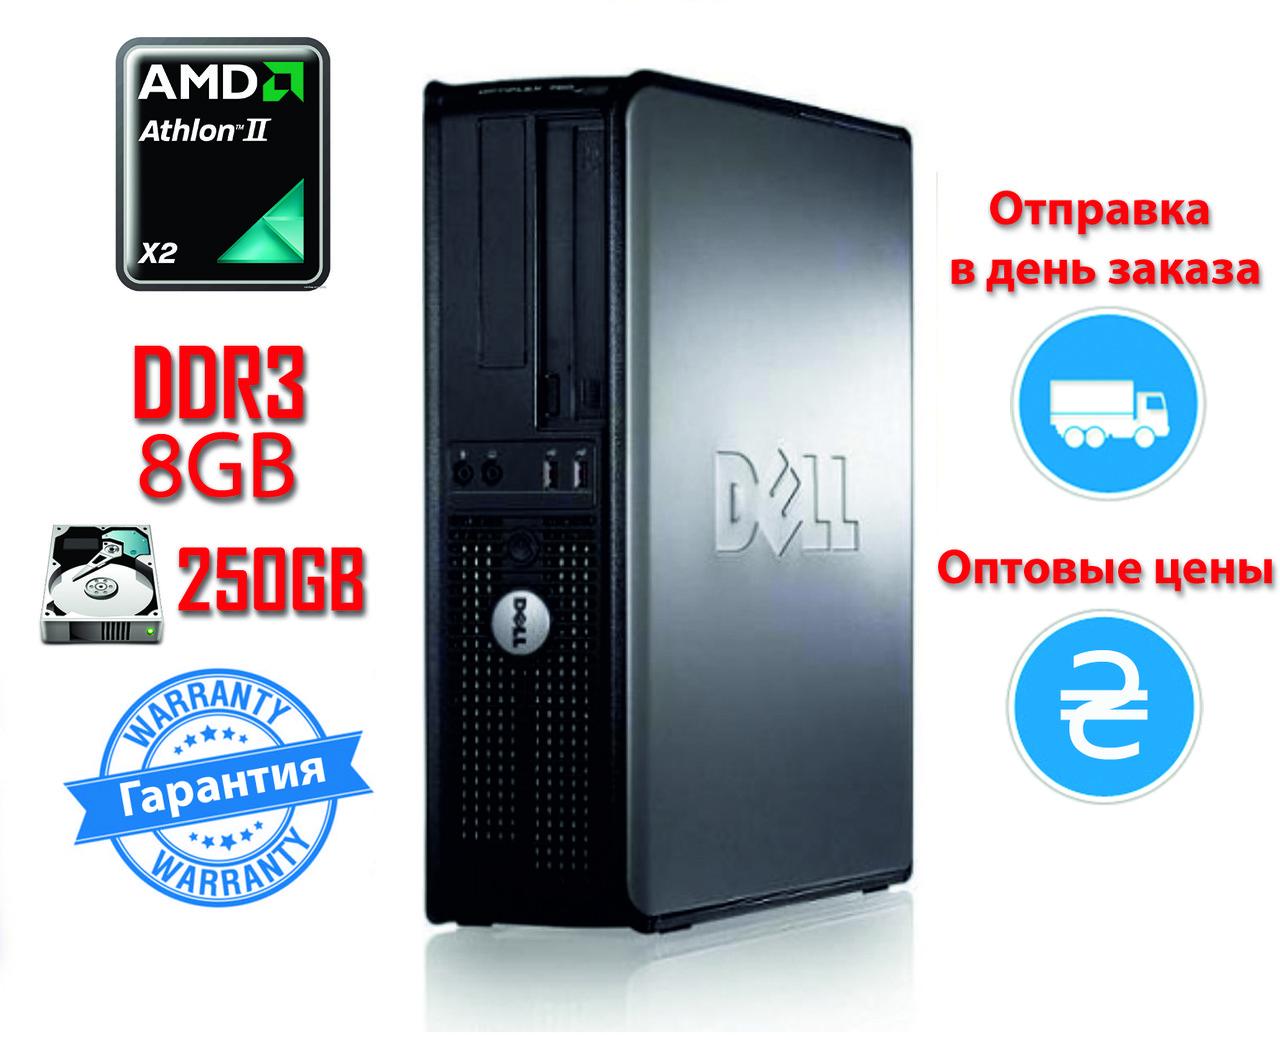 Cистемный блок DELL 2-ядра 2,8GHz/8Gb-DDR3/HDD-250Gb